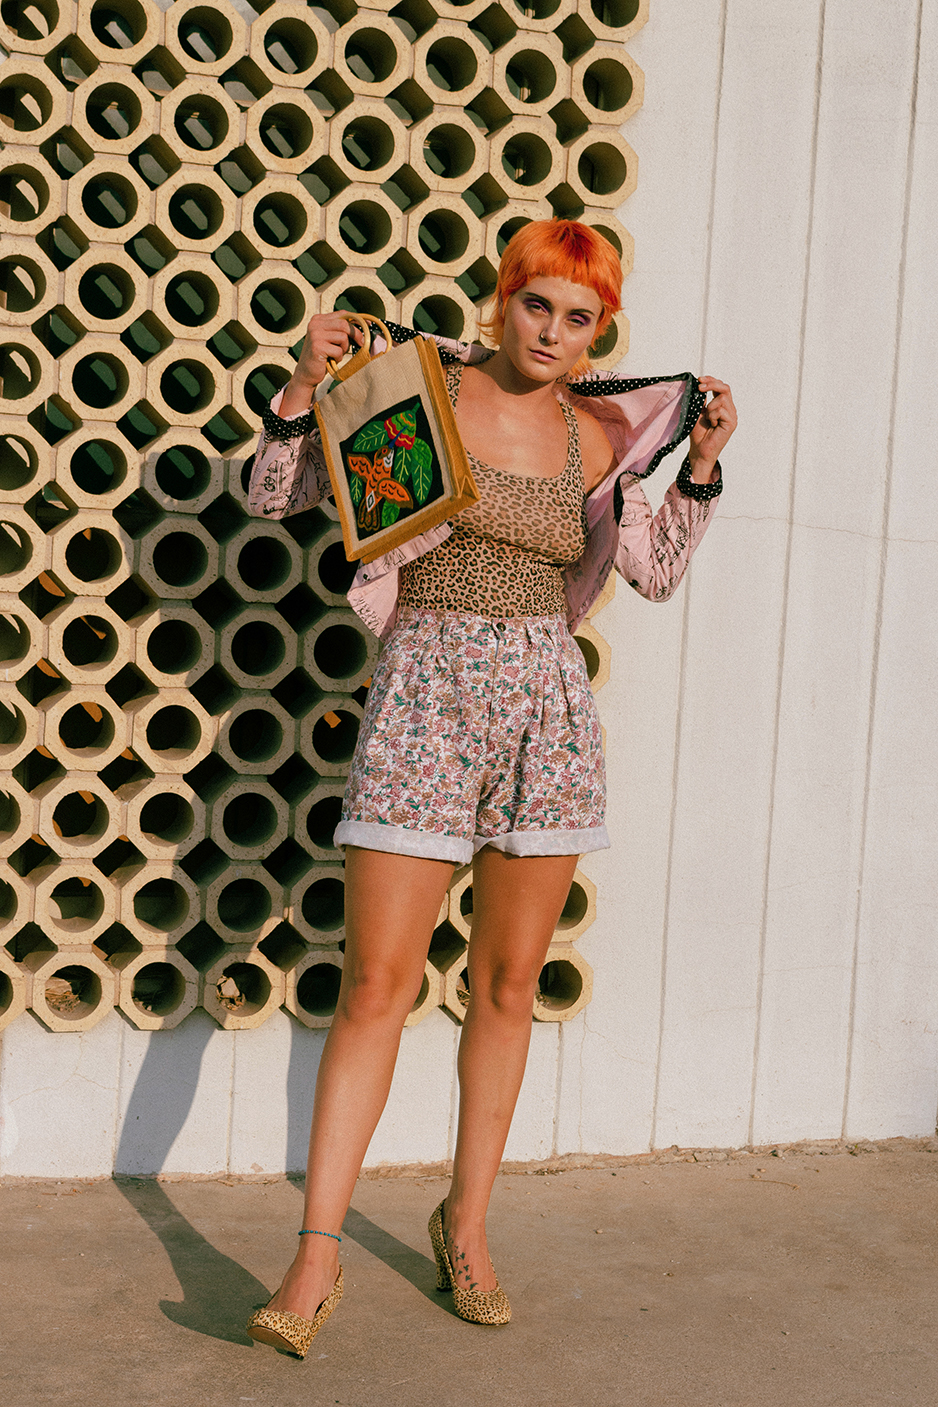 Meggie-Shorts-Leopard-3-smaller.jpg